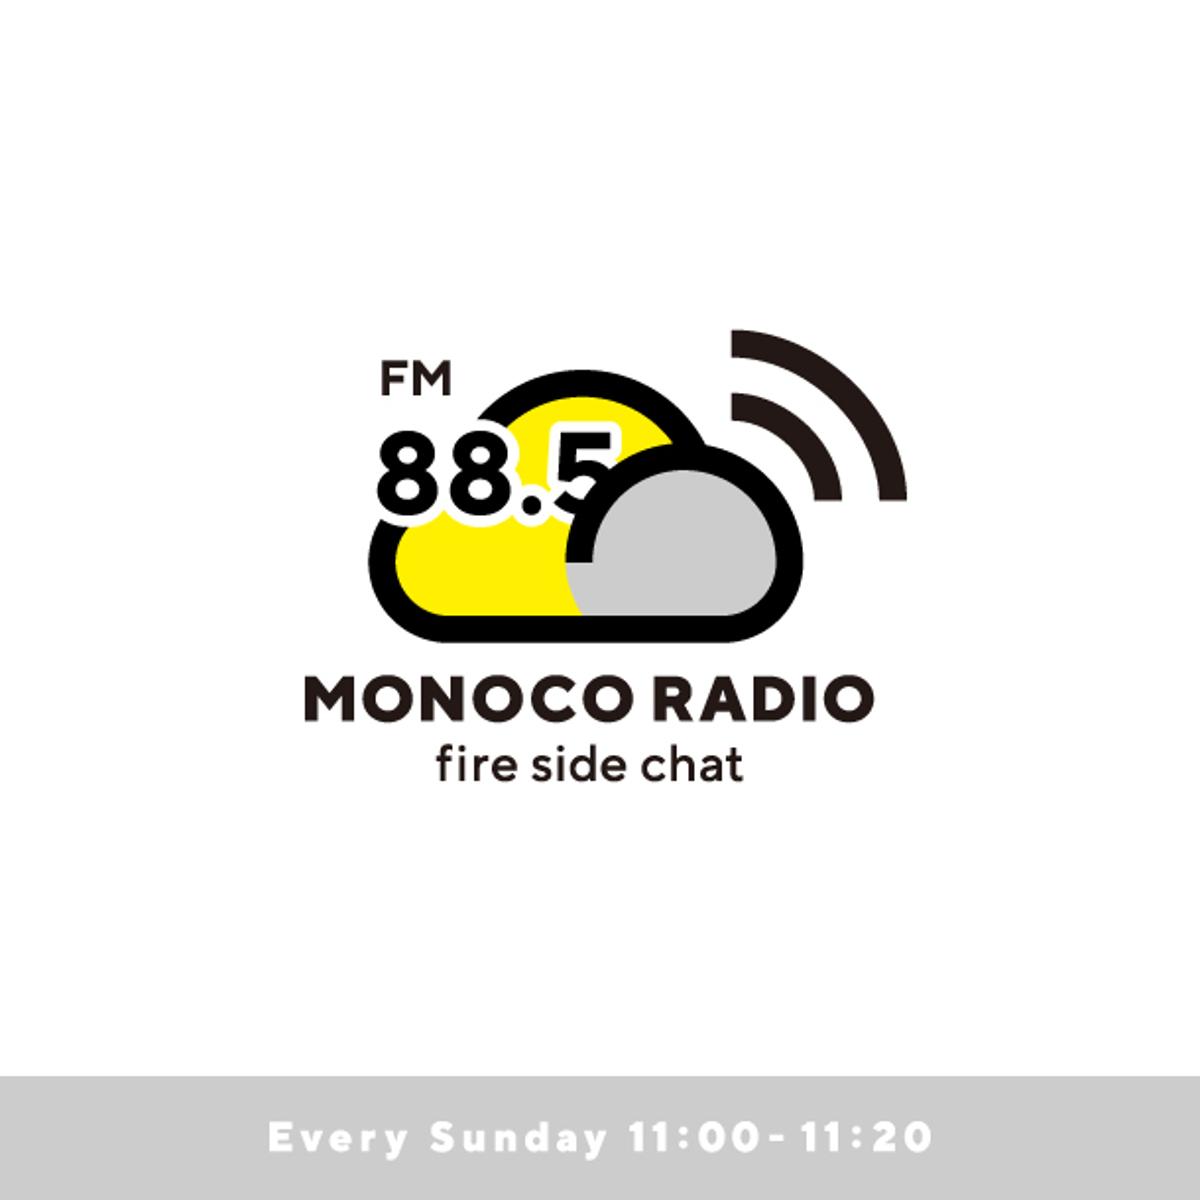 MONOCOの公式ラジオ番組が 4/4(日)スタート!